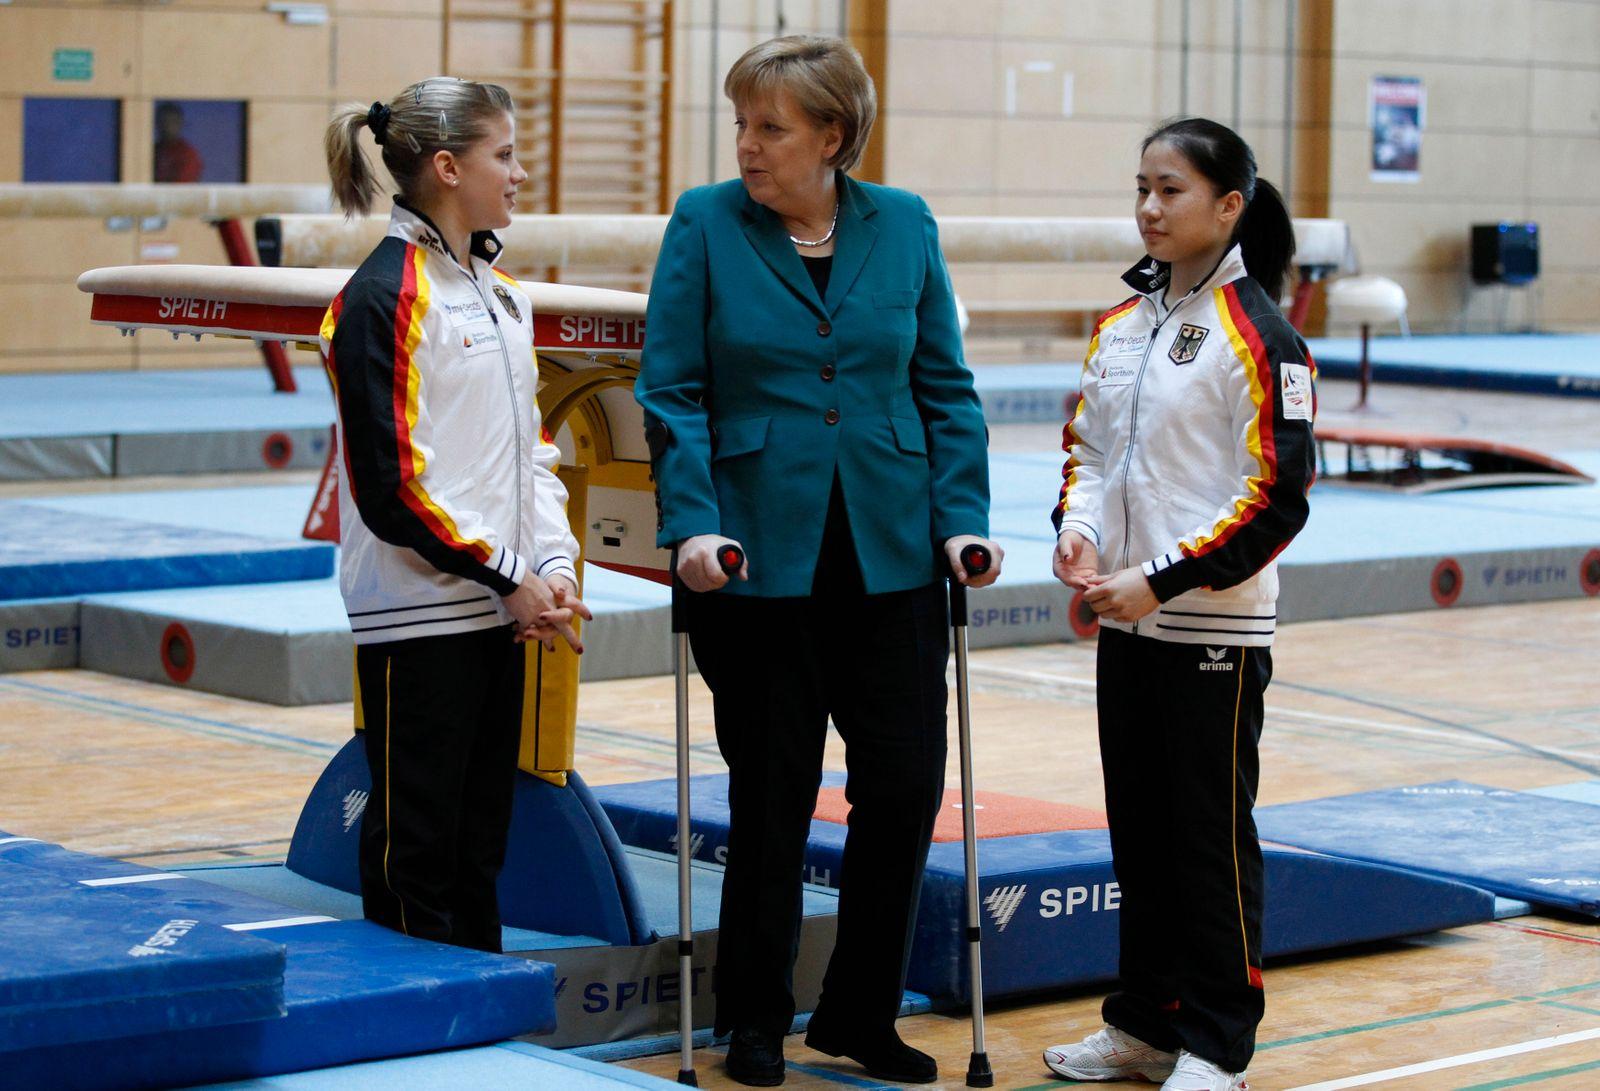 German Chancellor Merkel talks to members of German national team before official opening of Artistic Gymnastics European Championships in Berlin